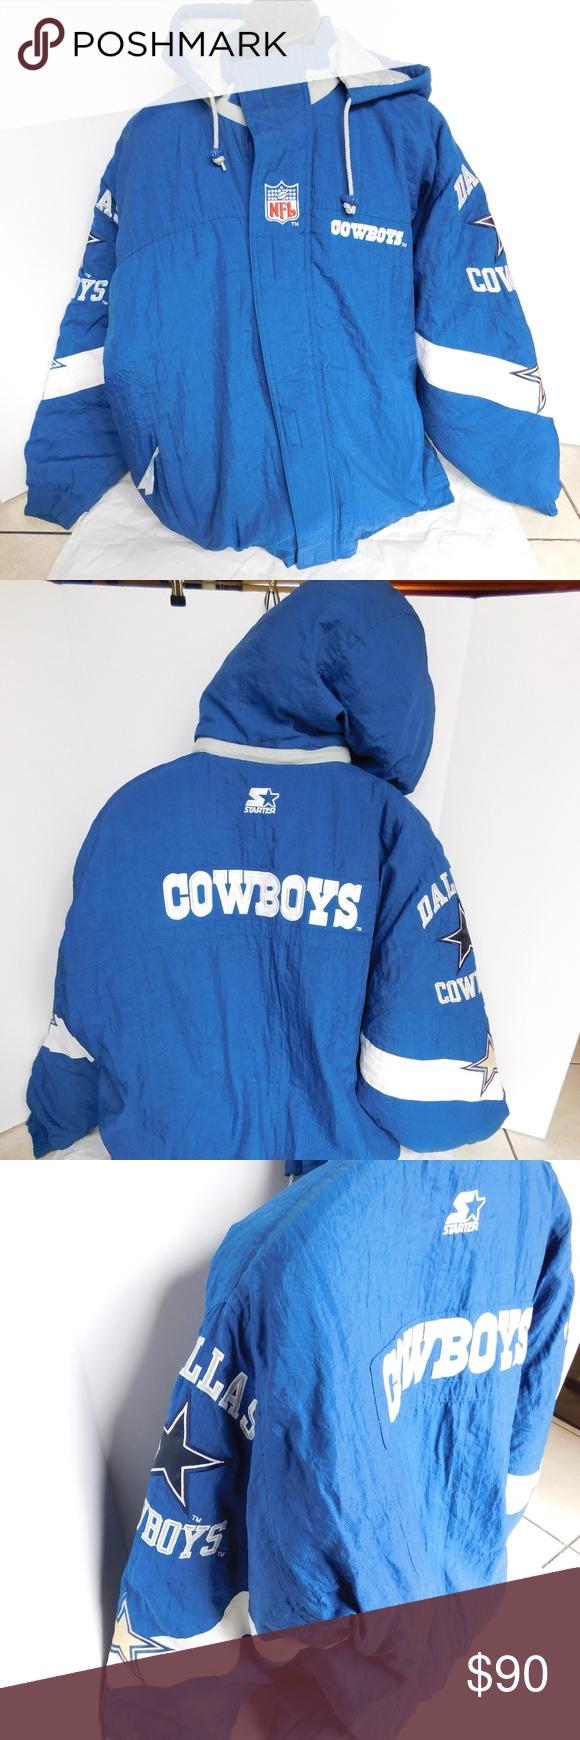 c82dbff9d 90 S Vintage Pro Line Dallas Cowboys Jacket Title- VINTAGE APEX ONE DALLAS  COWBOYS WINDBREAKER JACKET MEDIUM Brand- PRO LINE STARTER Style-  WINDBREAKER ...